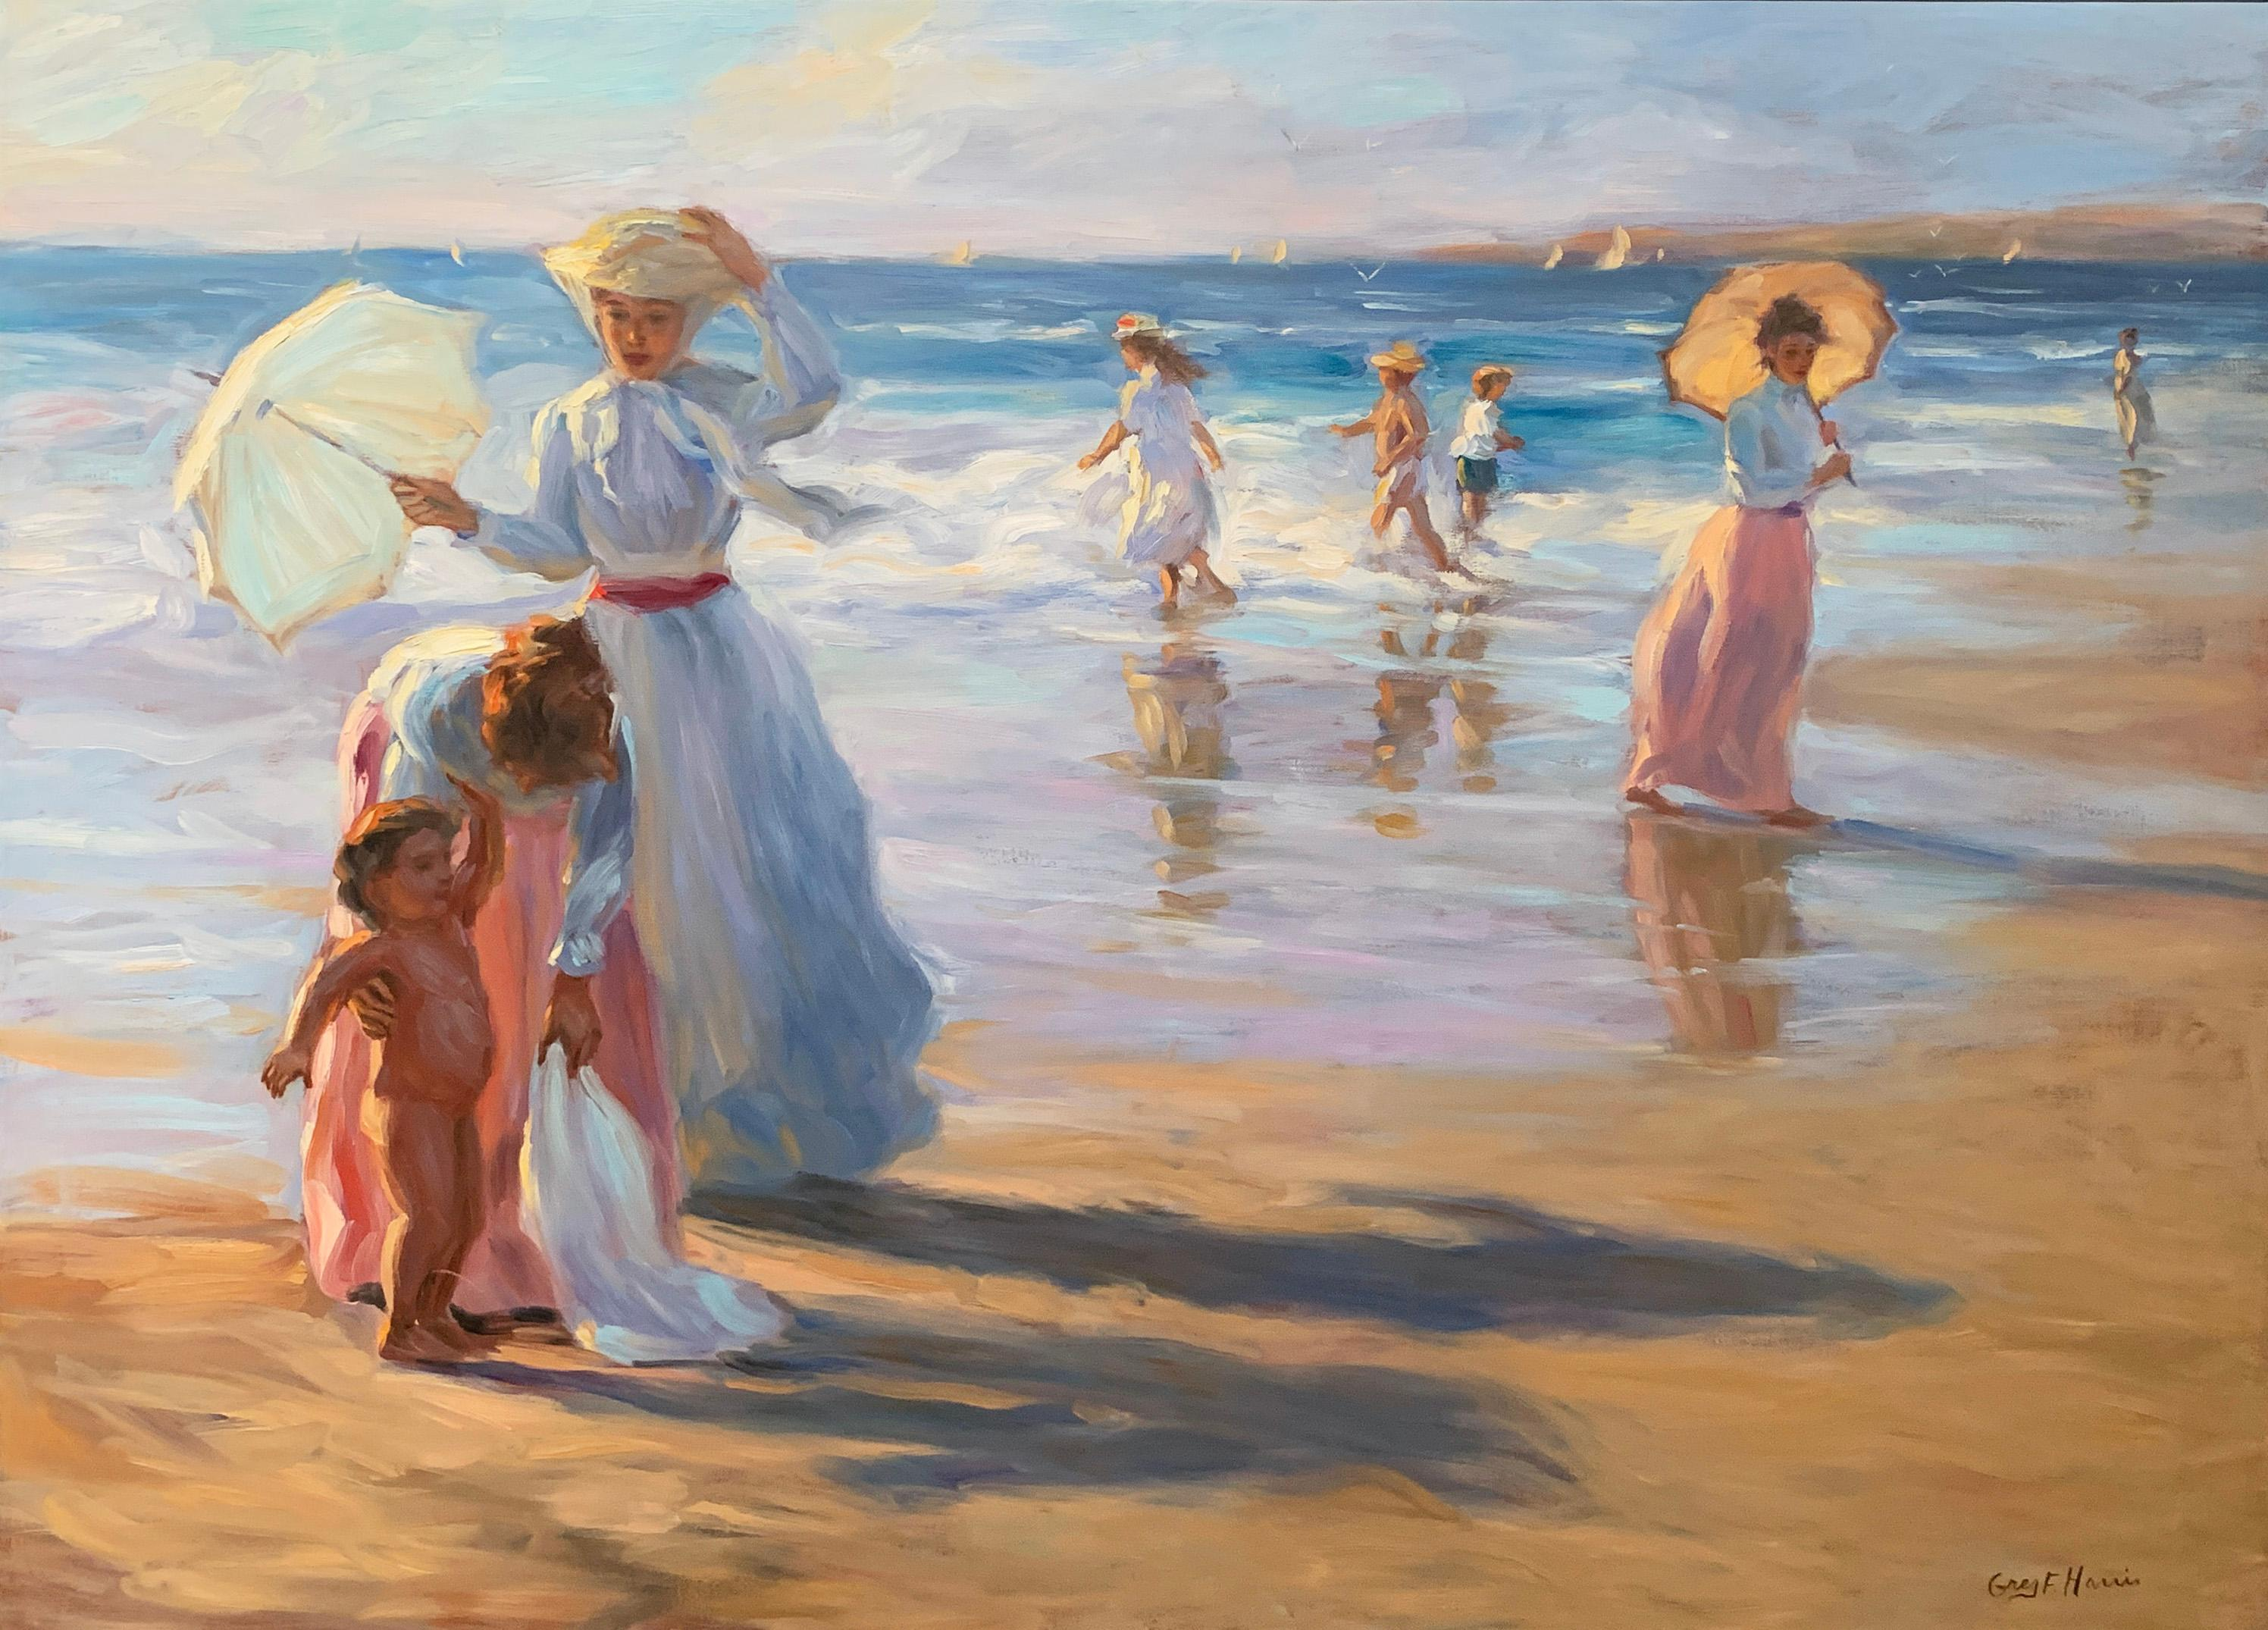 """On The Beach"", Greg Harris, Original Oil, Figurative, Landscape, 36x48 in."